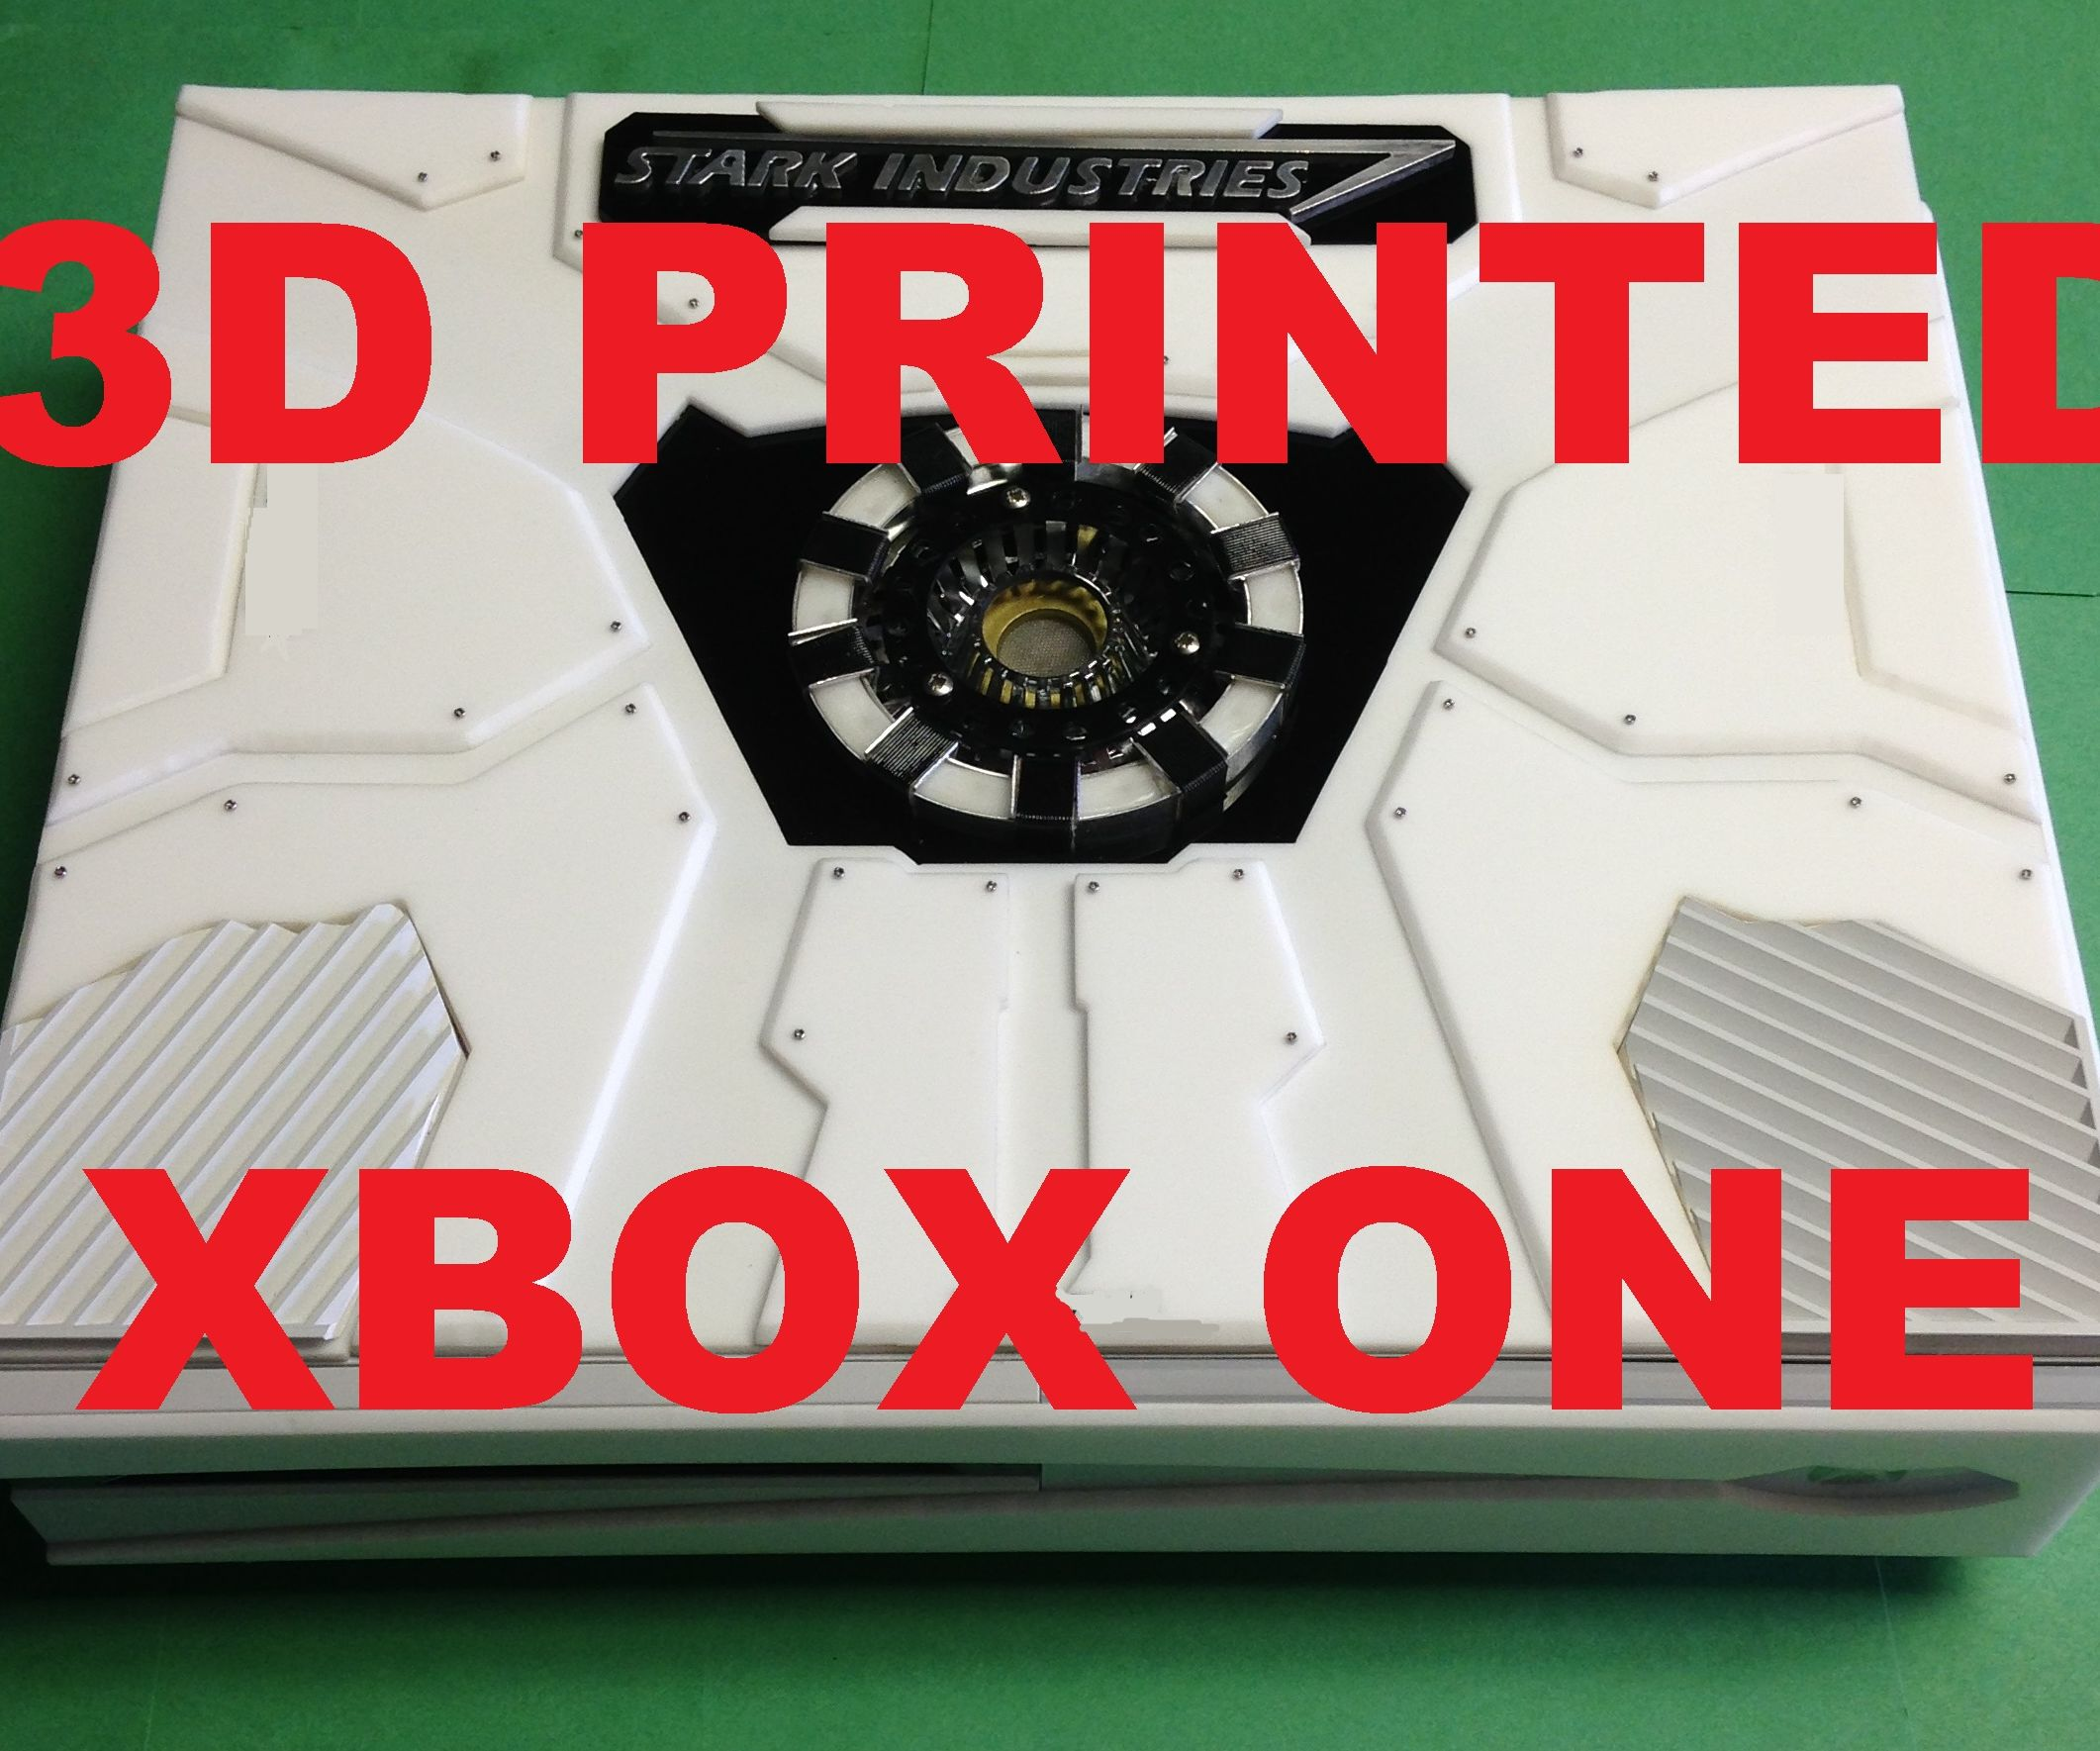 3D Printed Xbox One Iron Man